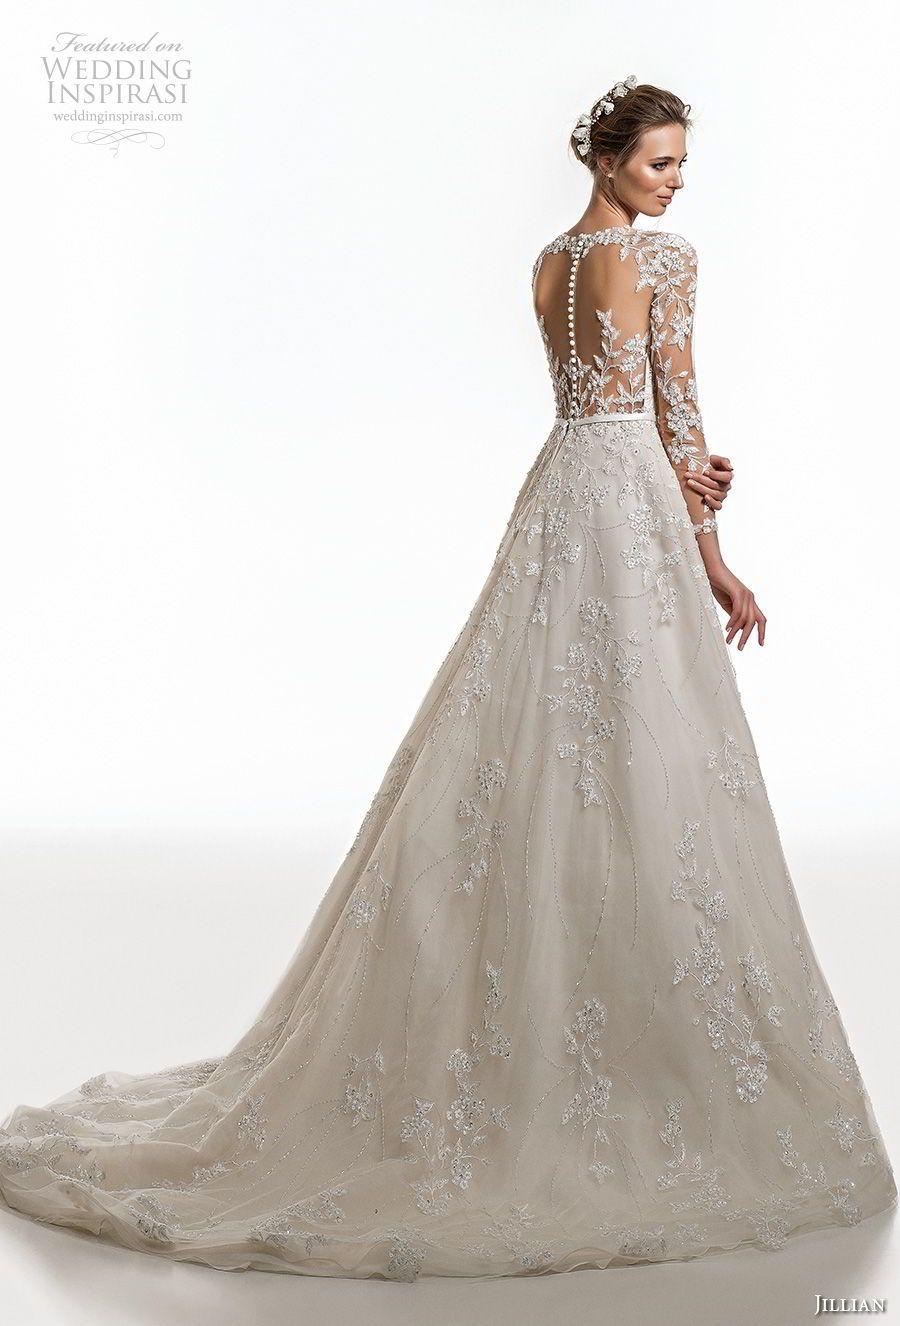 Jillian wedding dresses bella sposa ideas pinterest